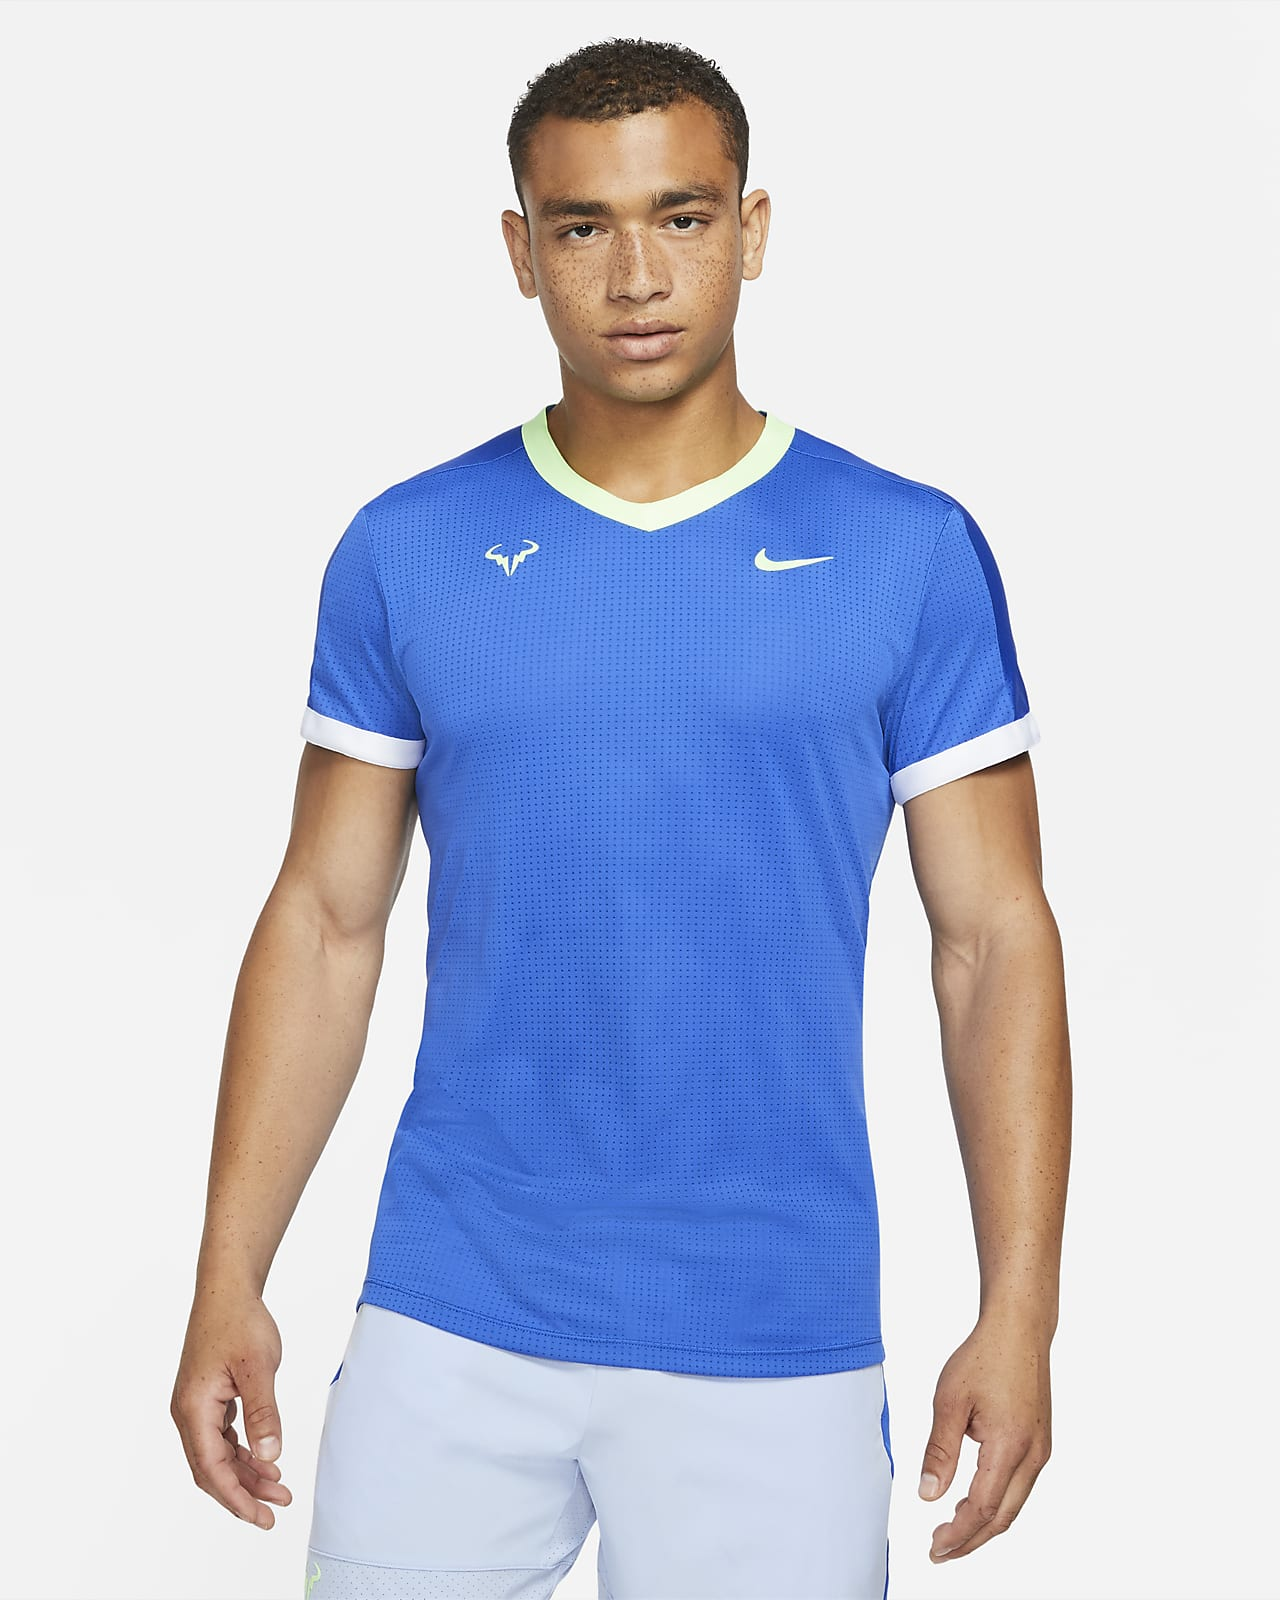 Camiseta de tenis de manga corta para hombre NikeCourt Dri-FIT ADV Rafa